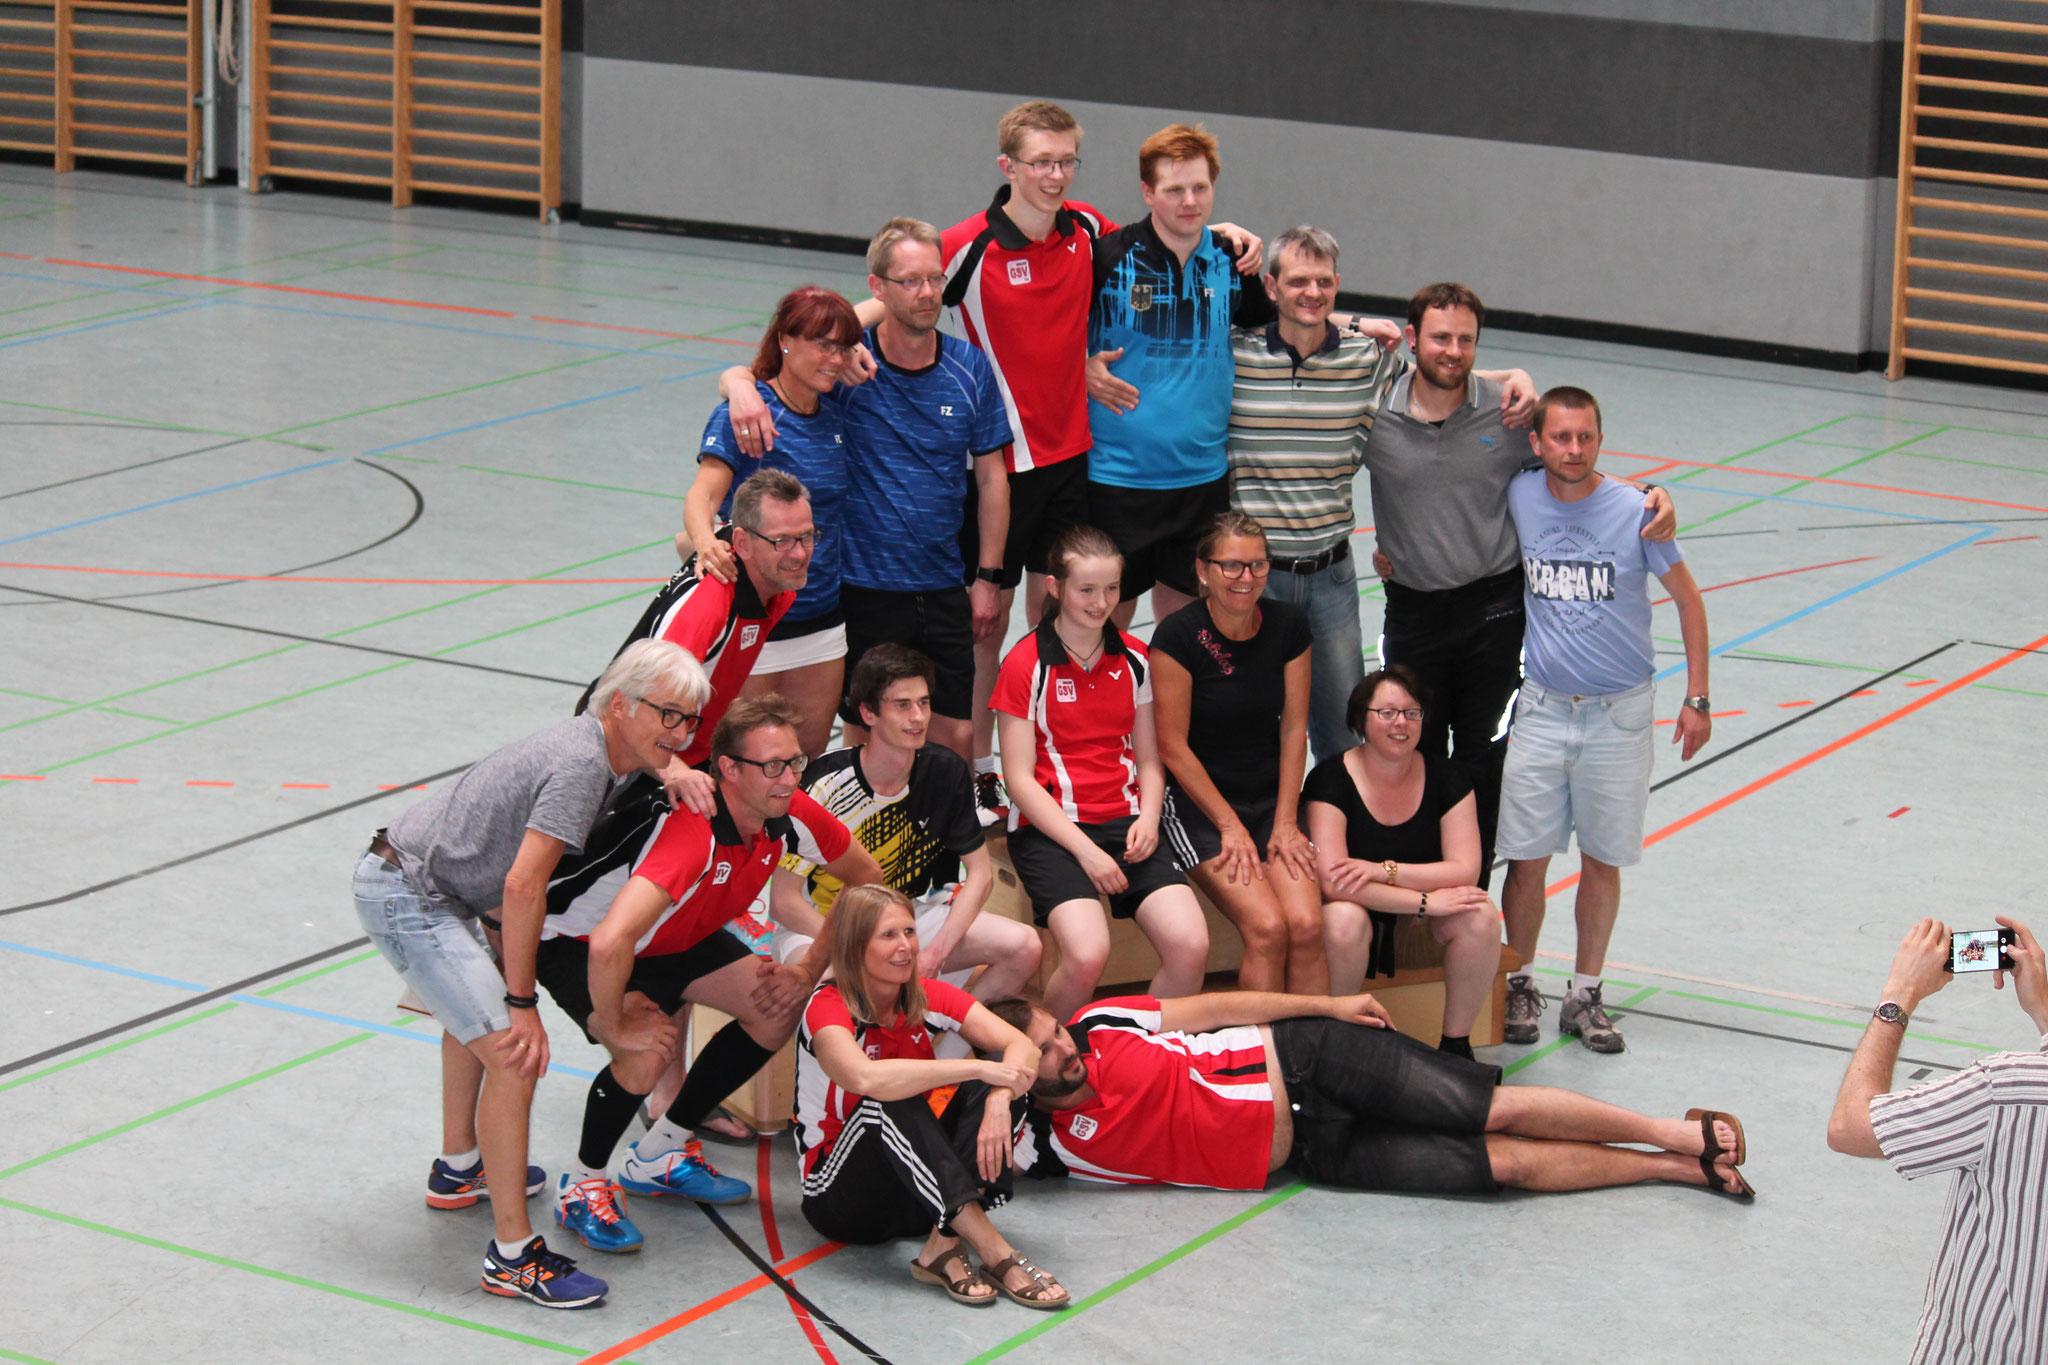 Gruppenbild aller Teilnehmer der DM in Nürnberg